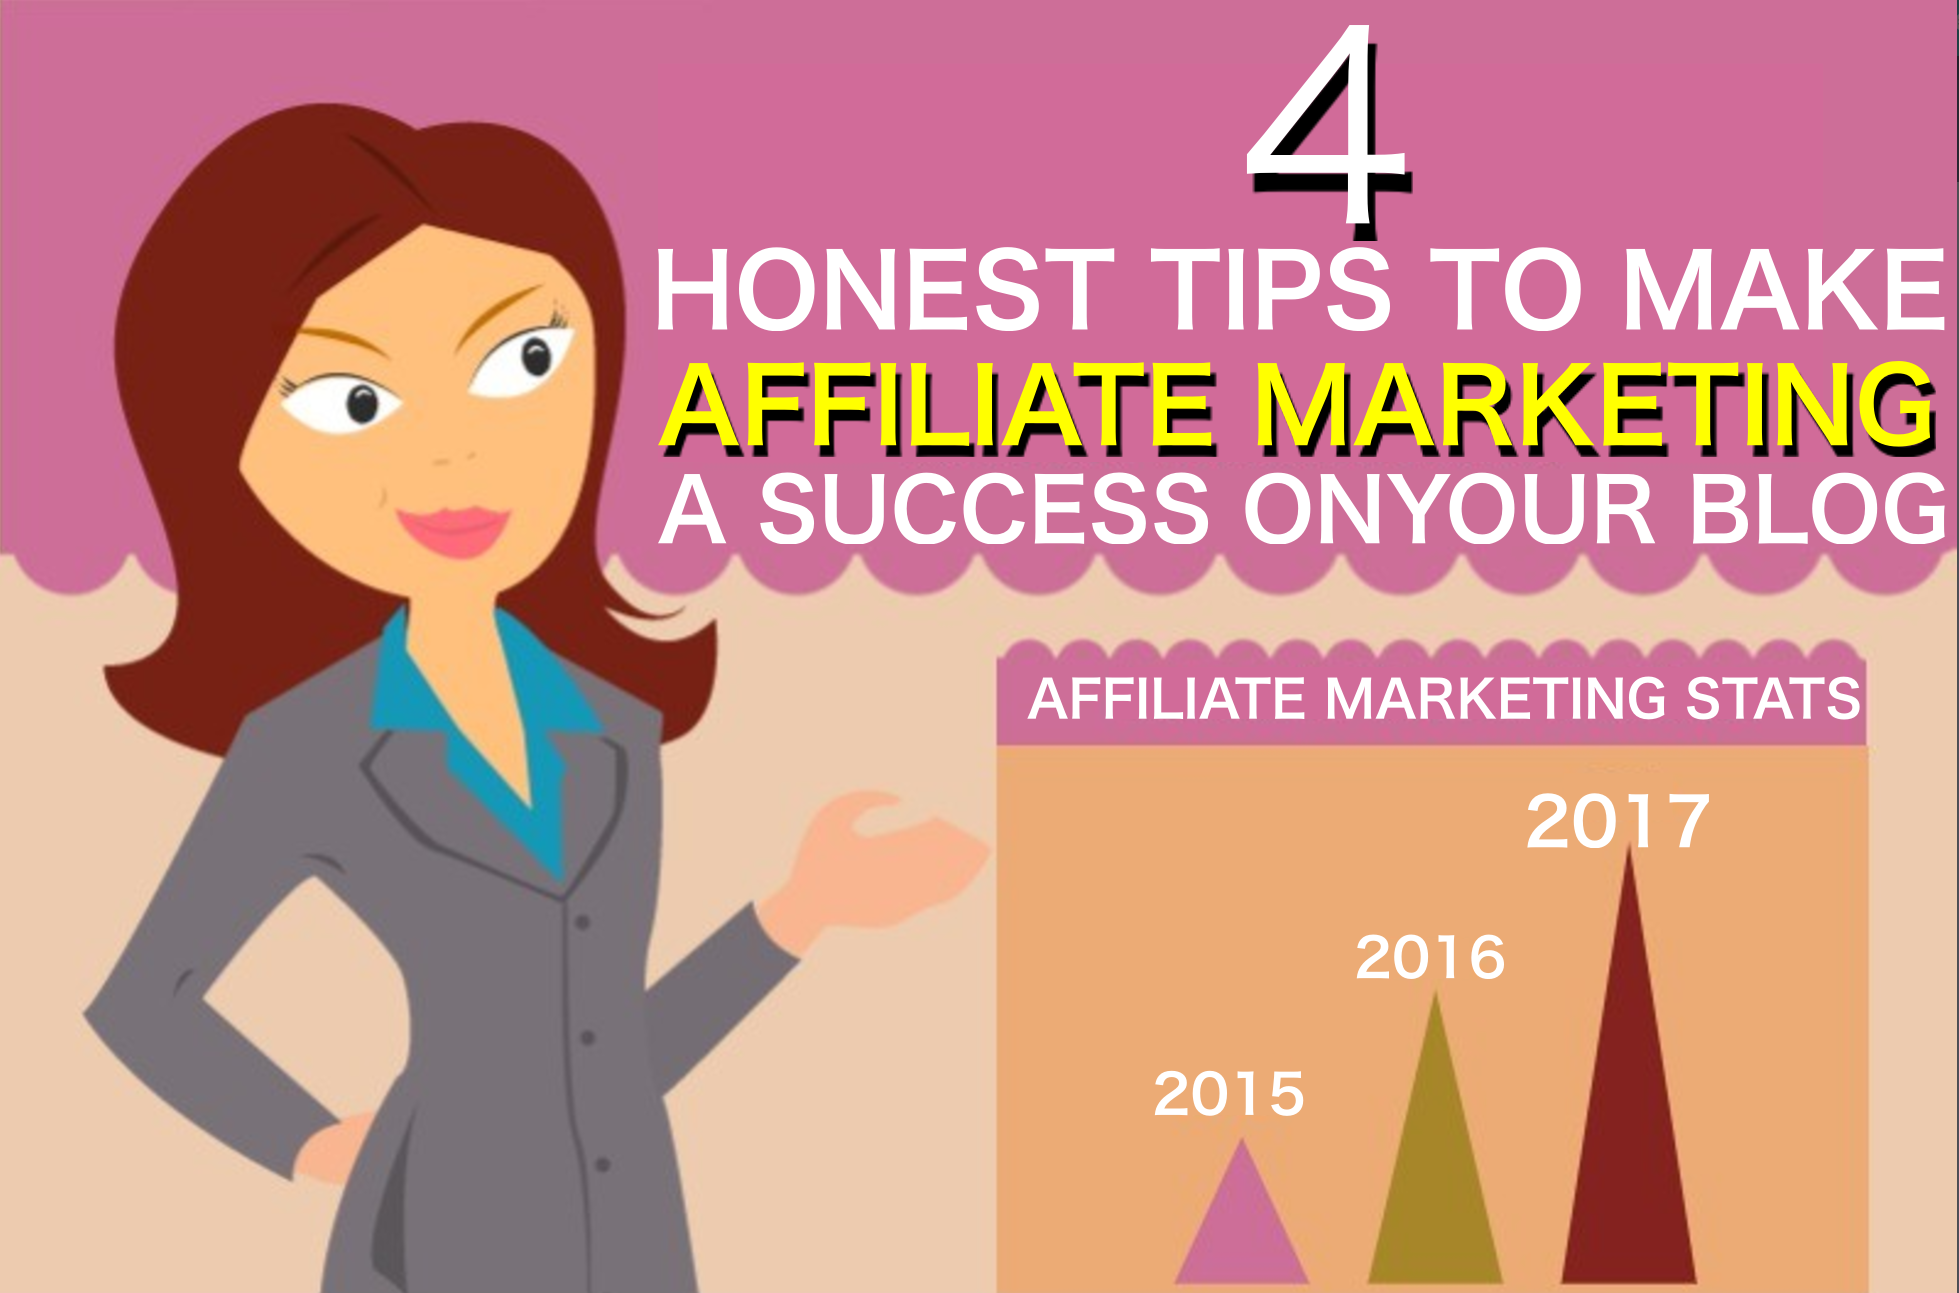 make-affiliate-marketing-a-success-to-your-blog